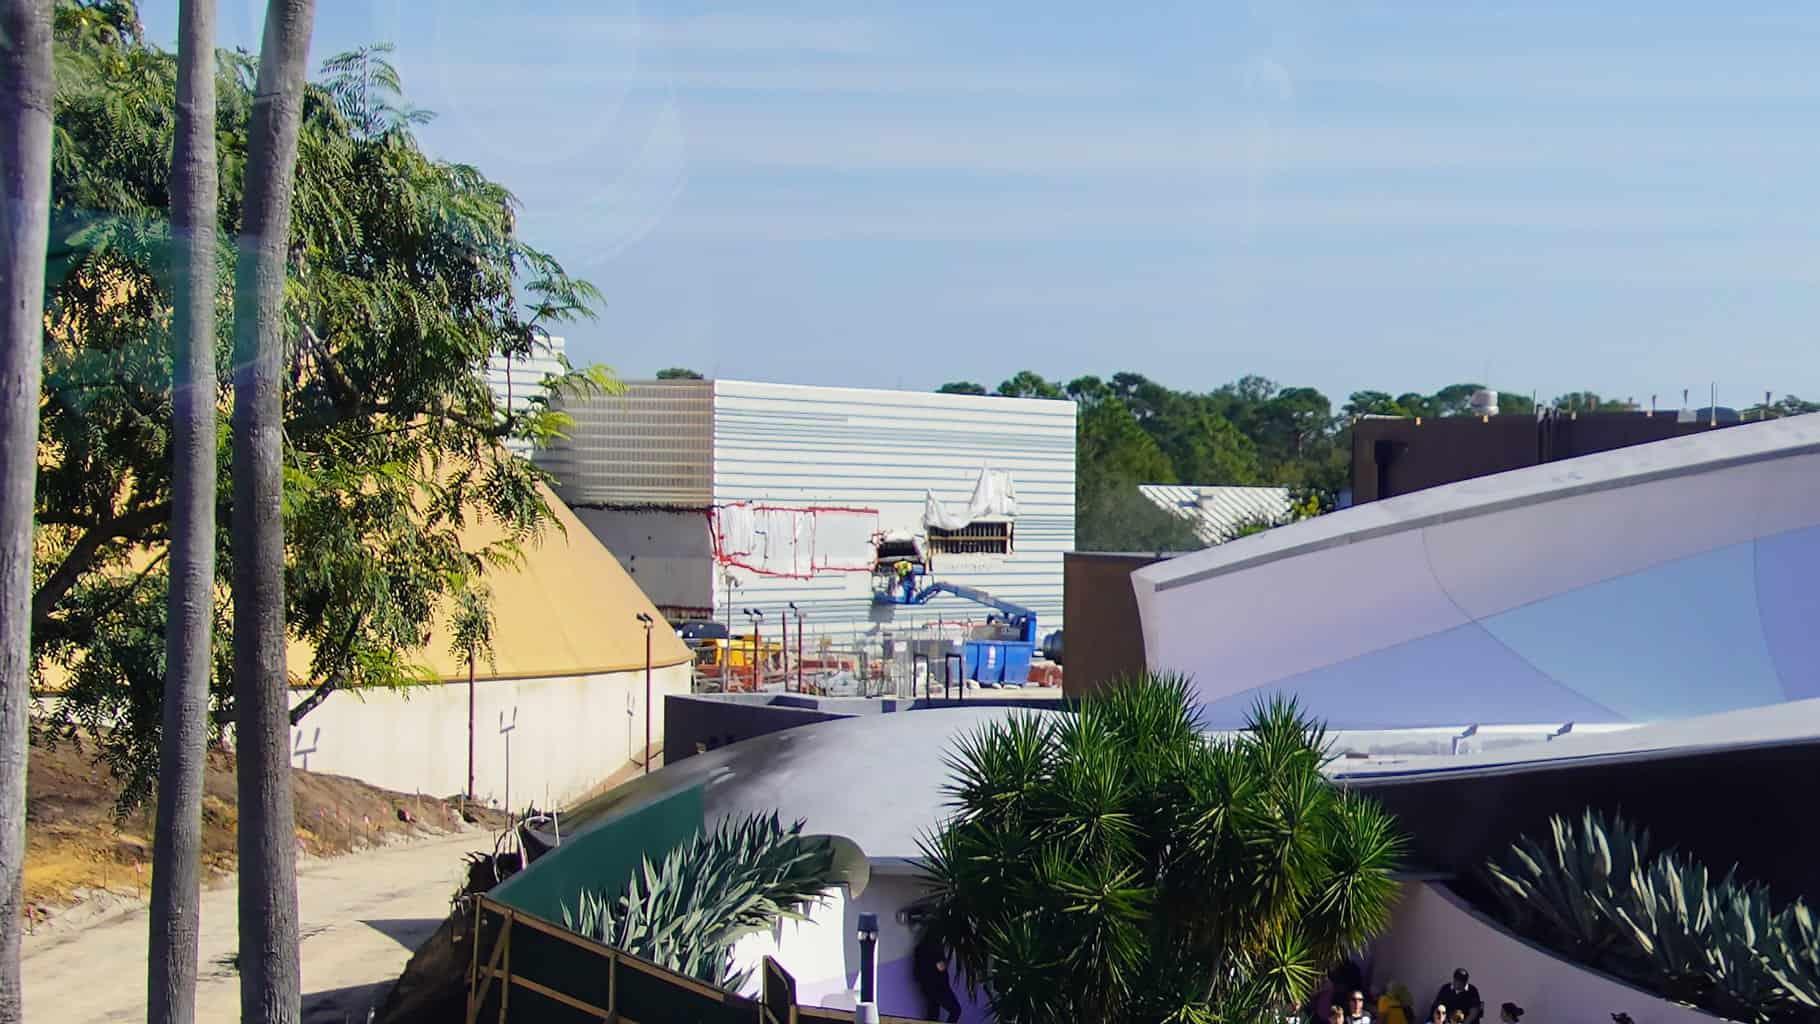 Play Pavilion progress Epcot Construction Updates November 2019